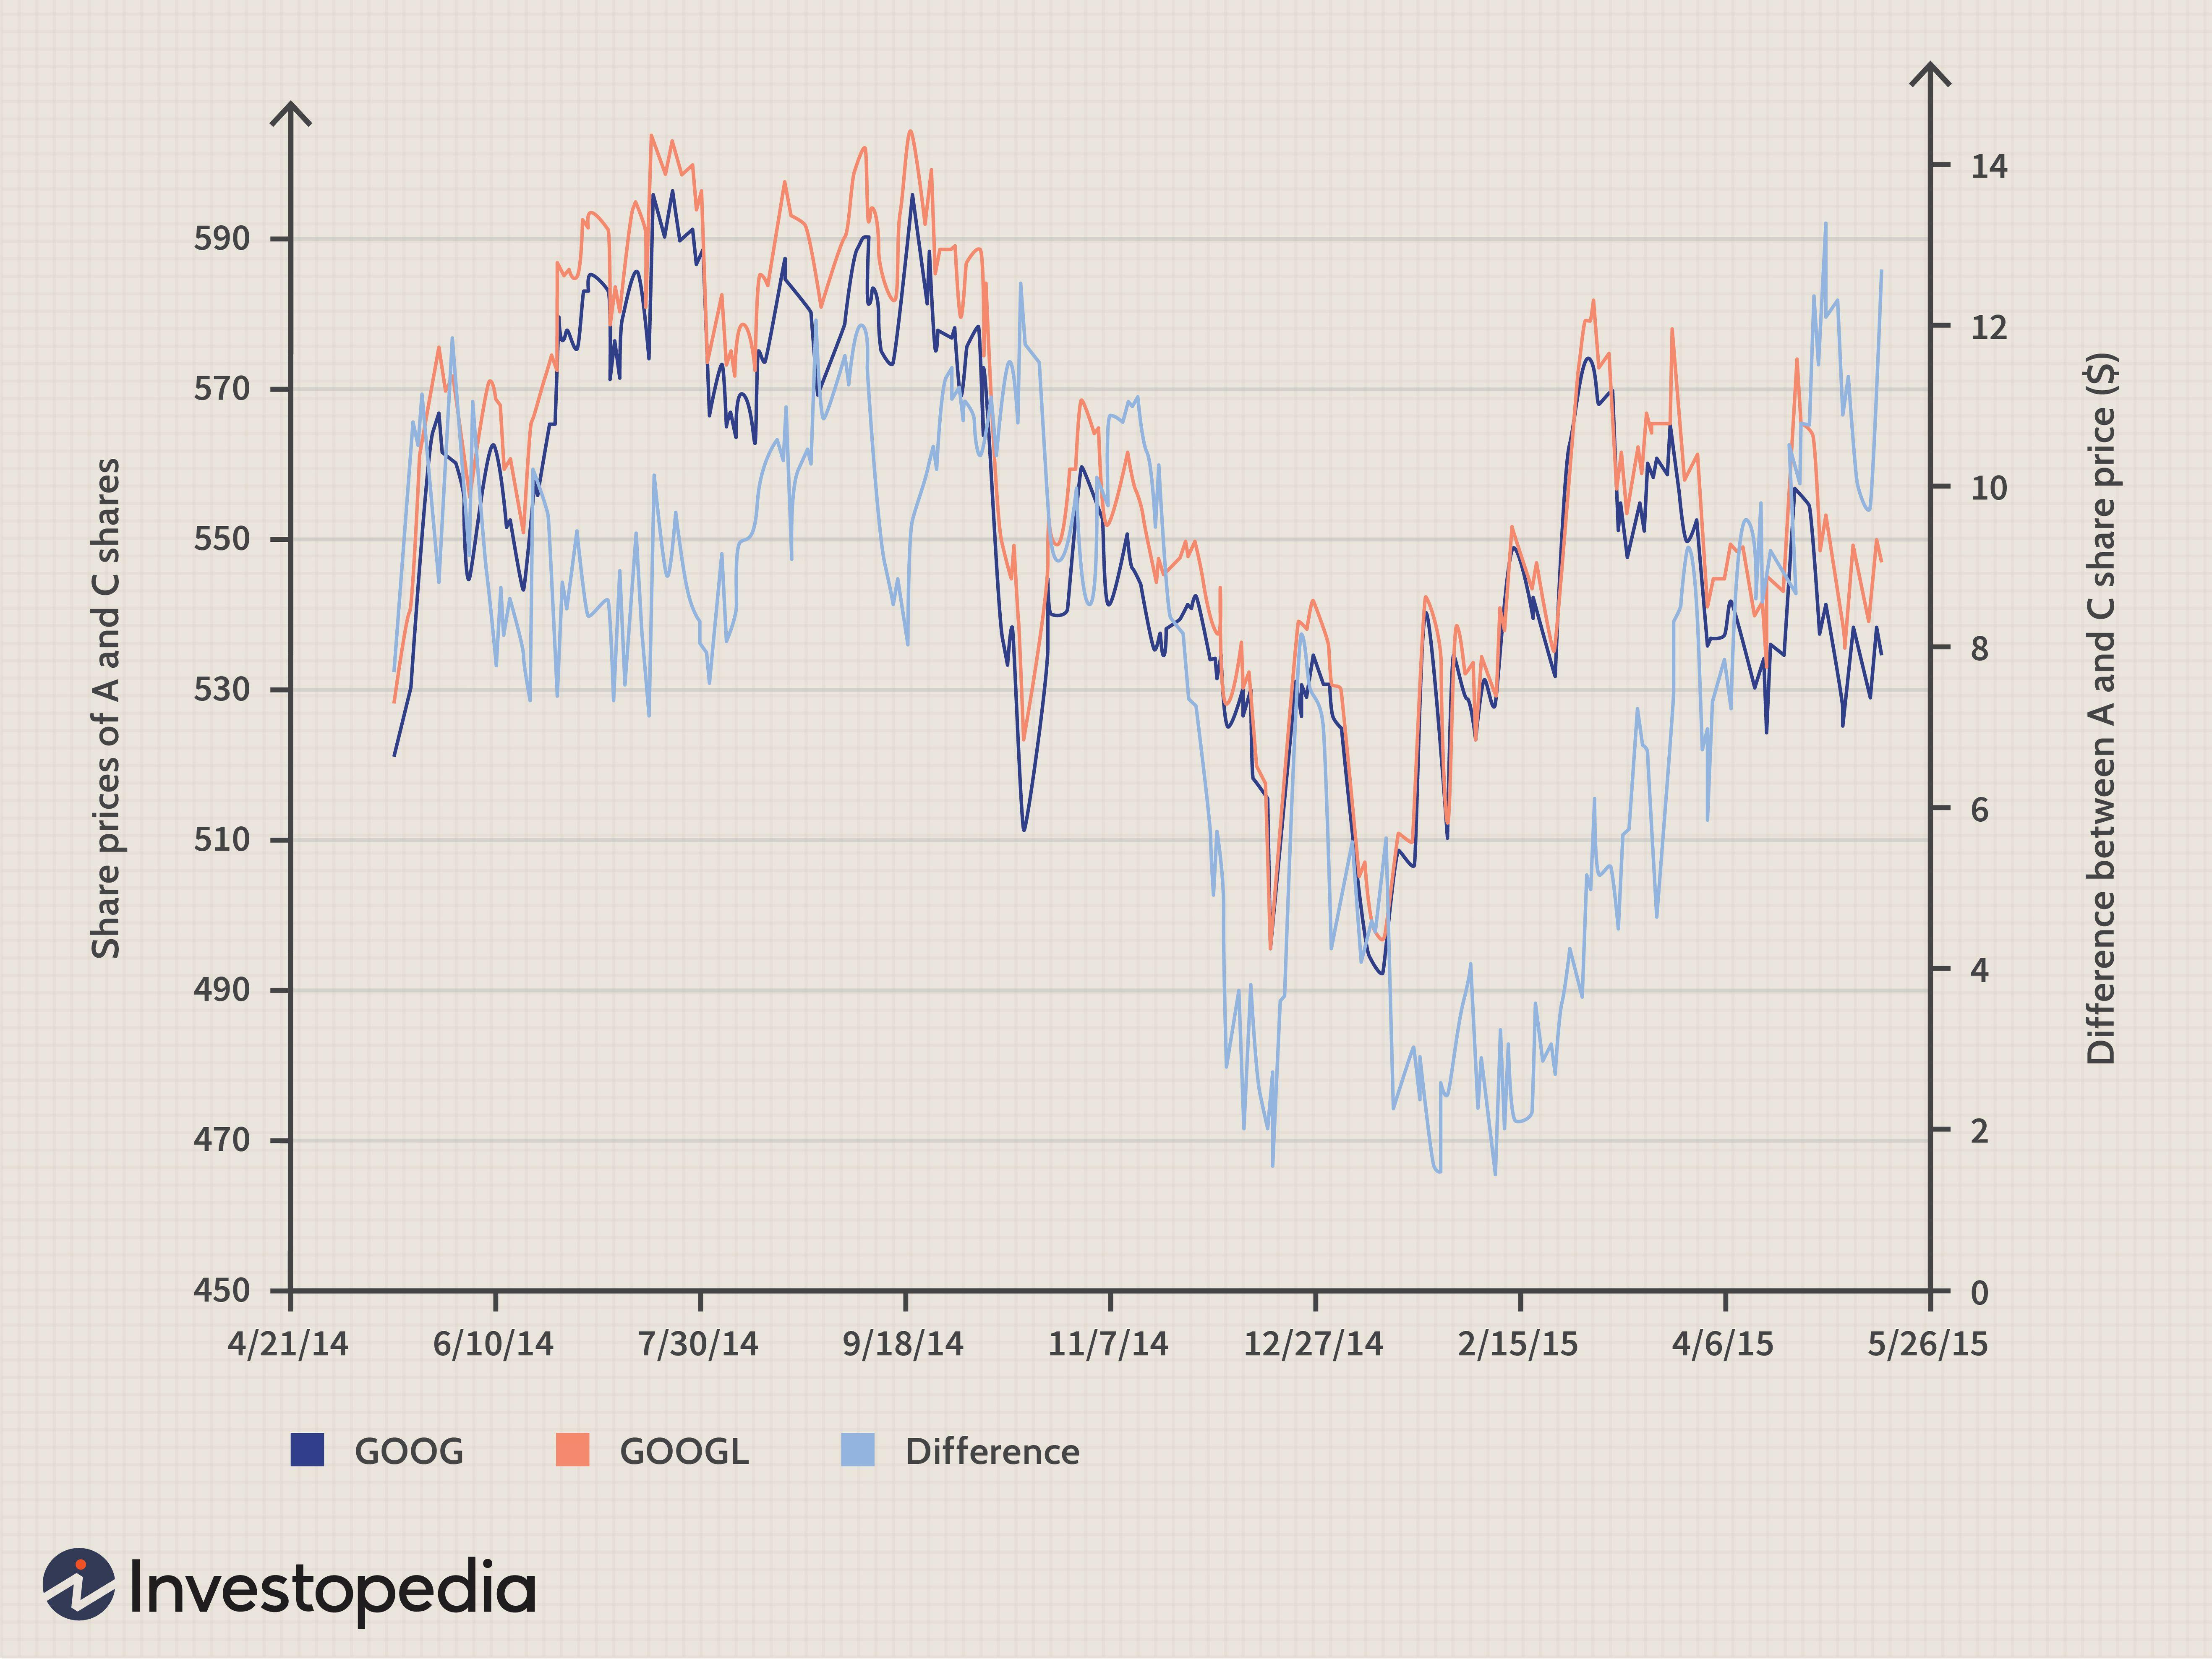 Monetary policy investopedia video on betting subnet mask cheat sheet binary options